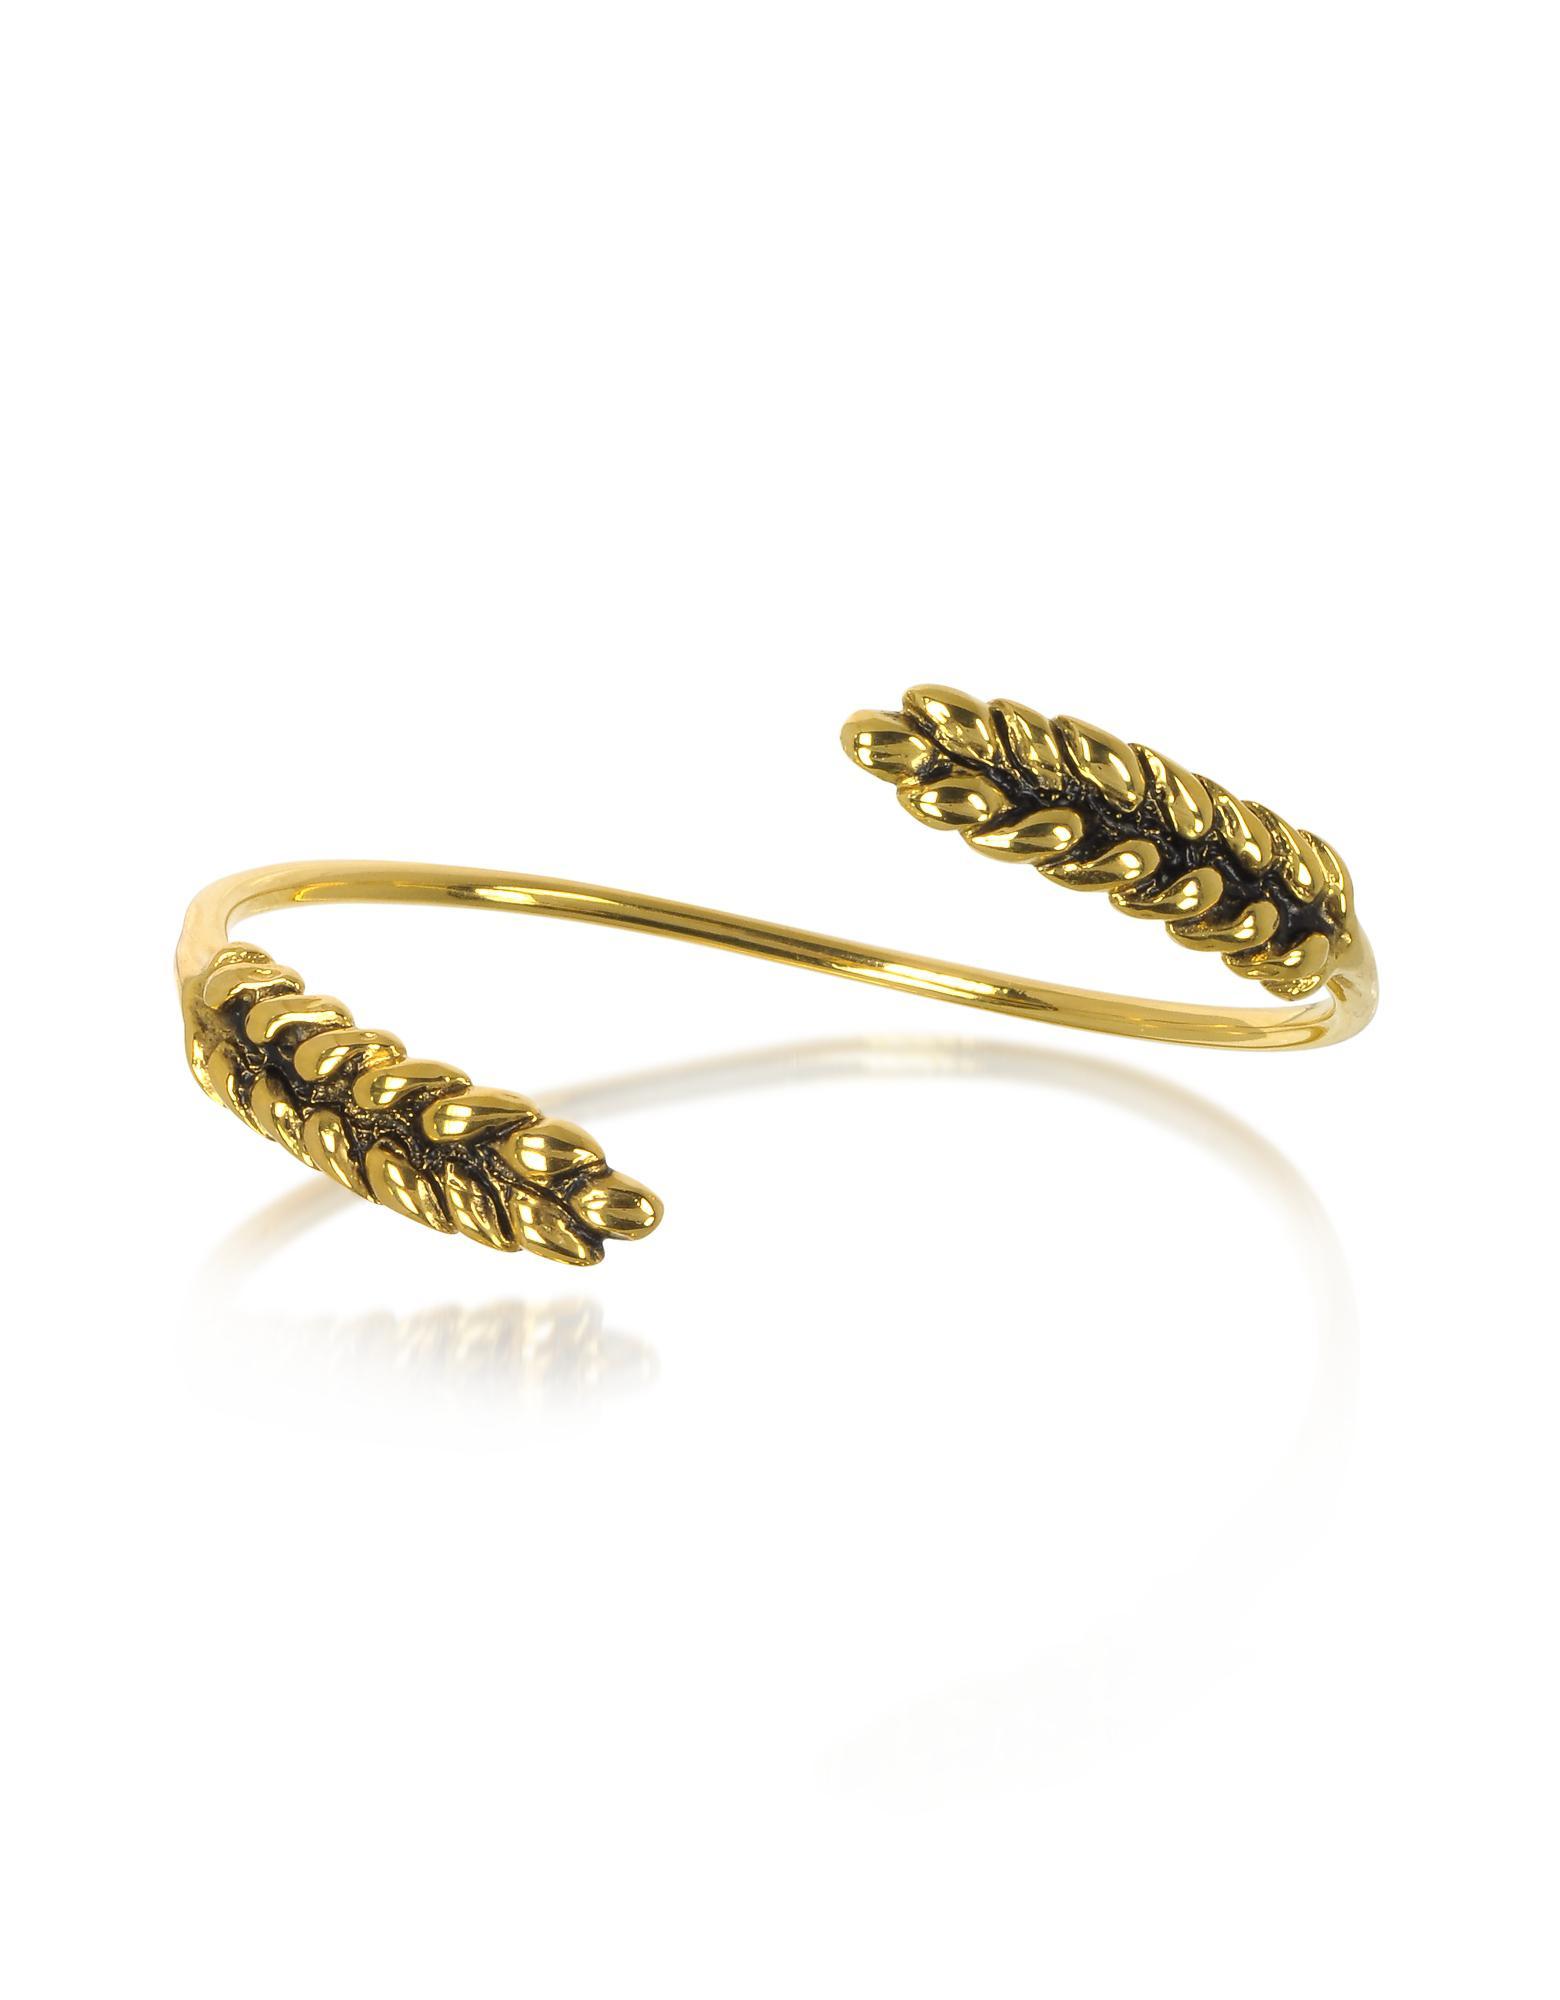 Wheat Mutli Cobs Bracelet in 18K Gold-Plated Brass Aur aU37F